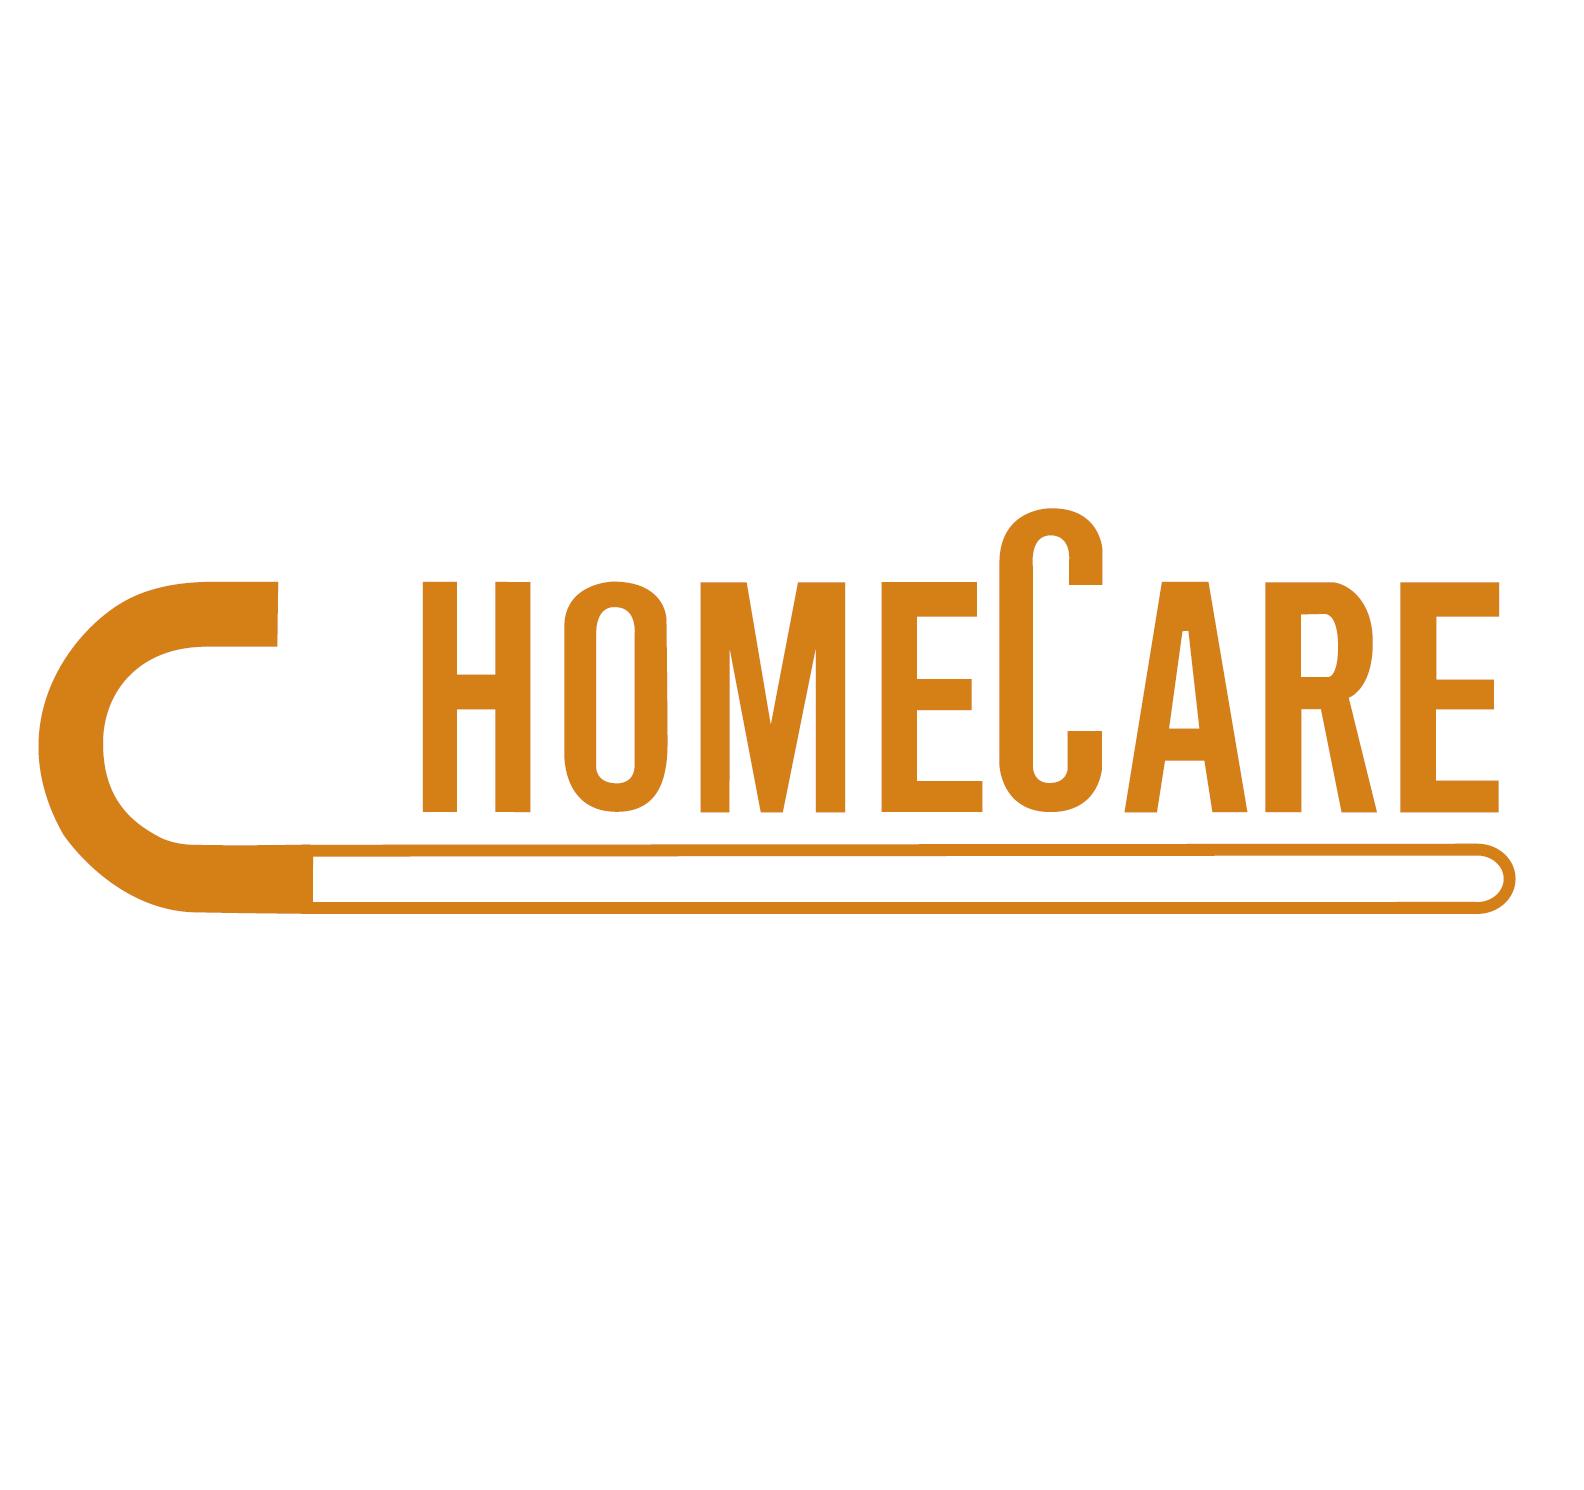 HOMECARE ENTERPRISE CO., LTD.